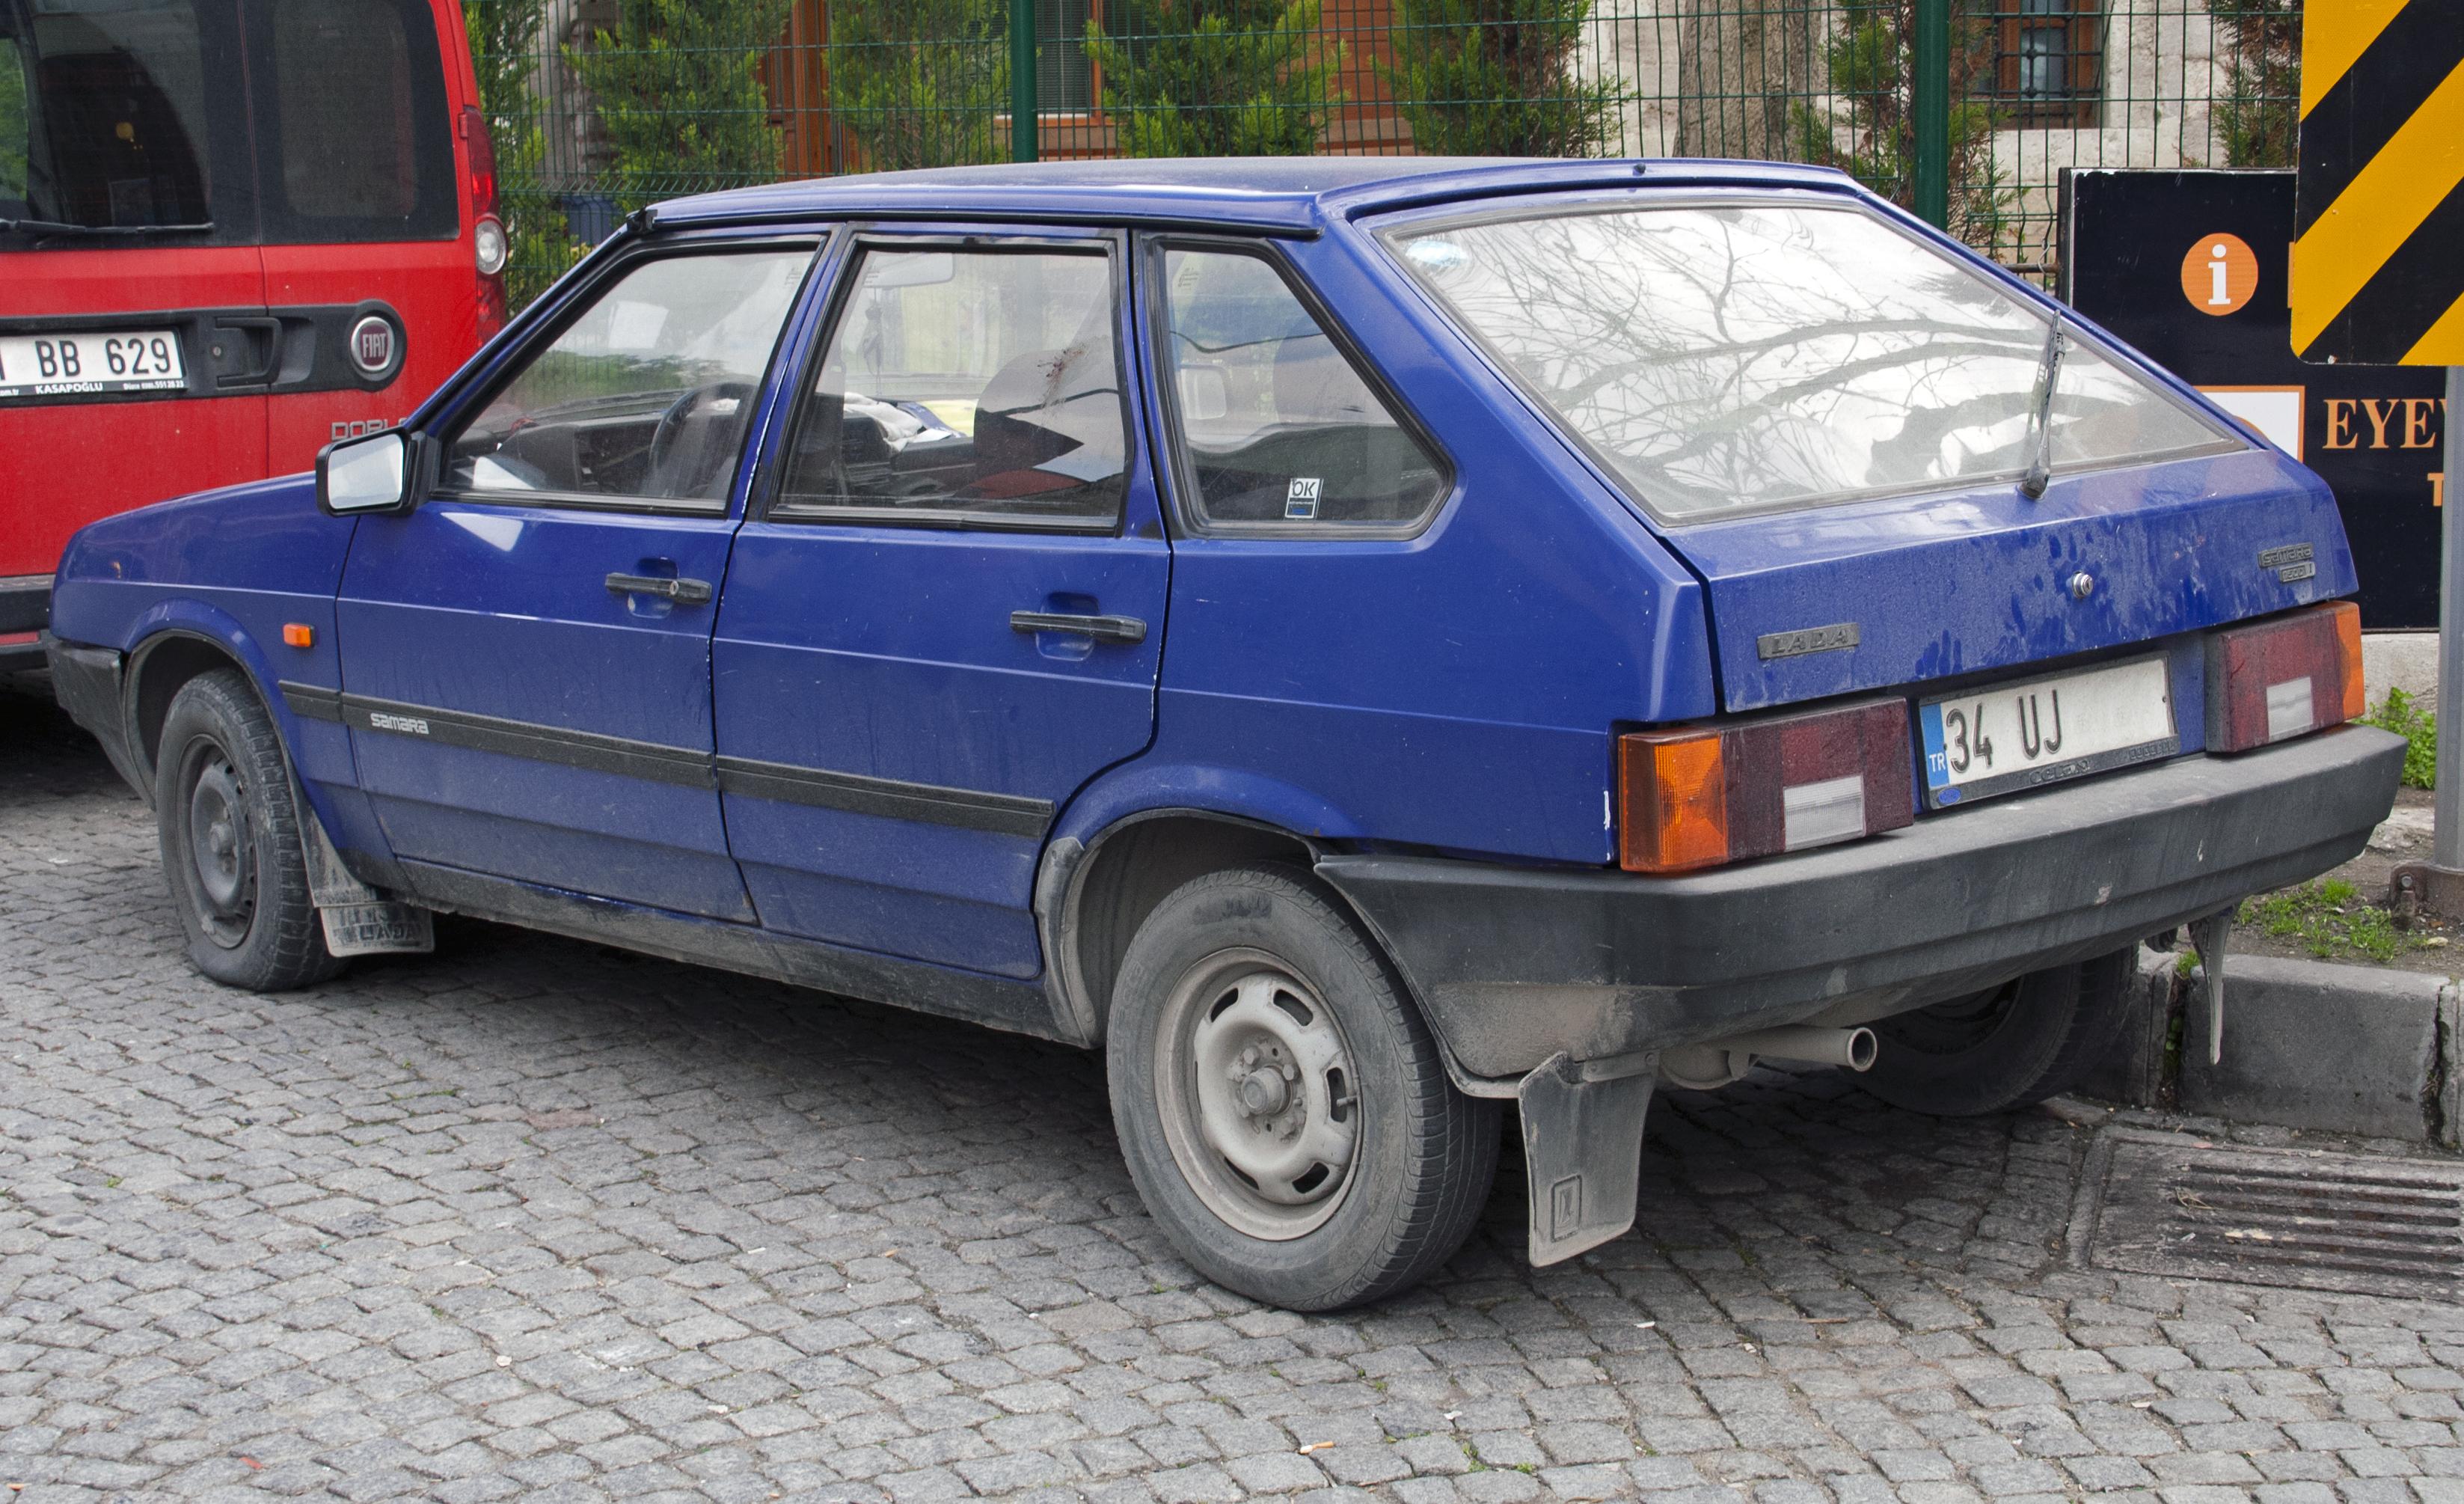 File:Lada Samara 1.5i 5dr rv.jpg - Wikimedia Commons